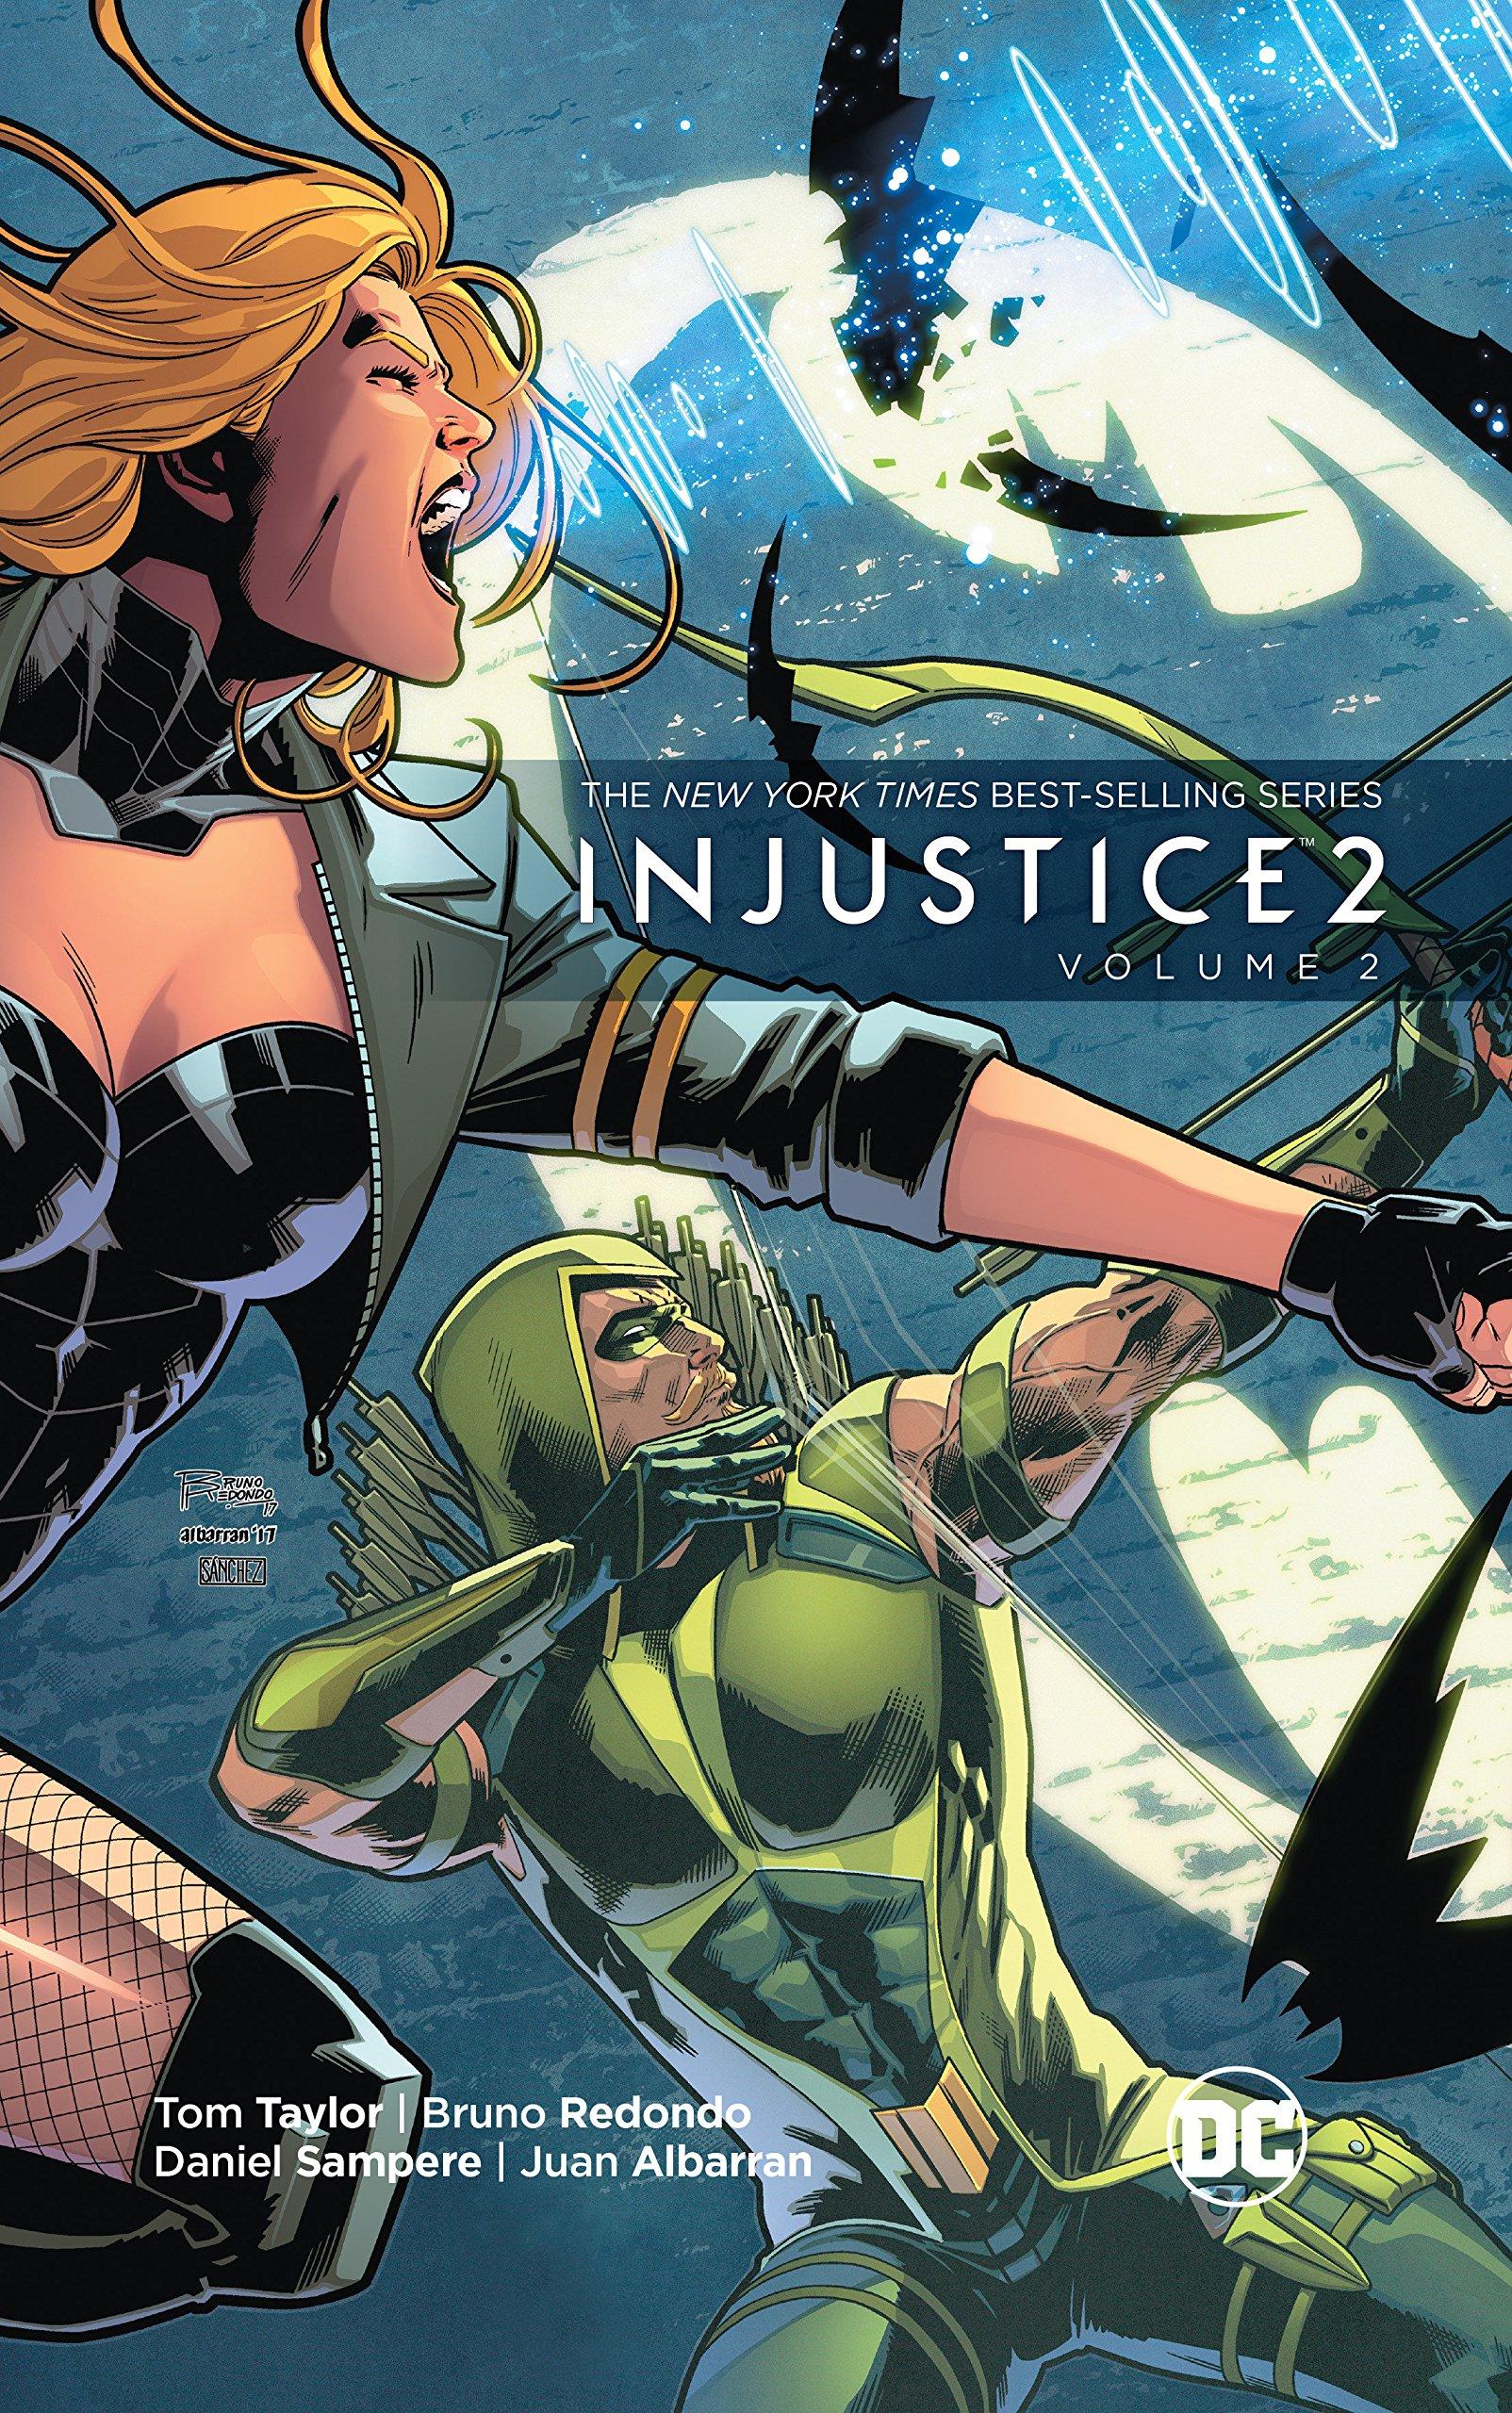 Injustice 2 Vol. 2: Tom Taylor, Bruno Redondo: 9781401278410 ...